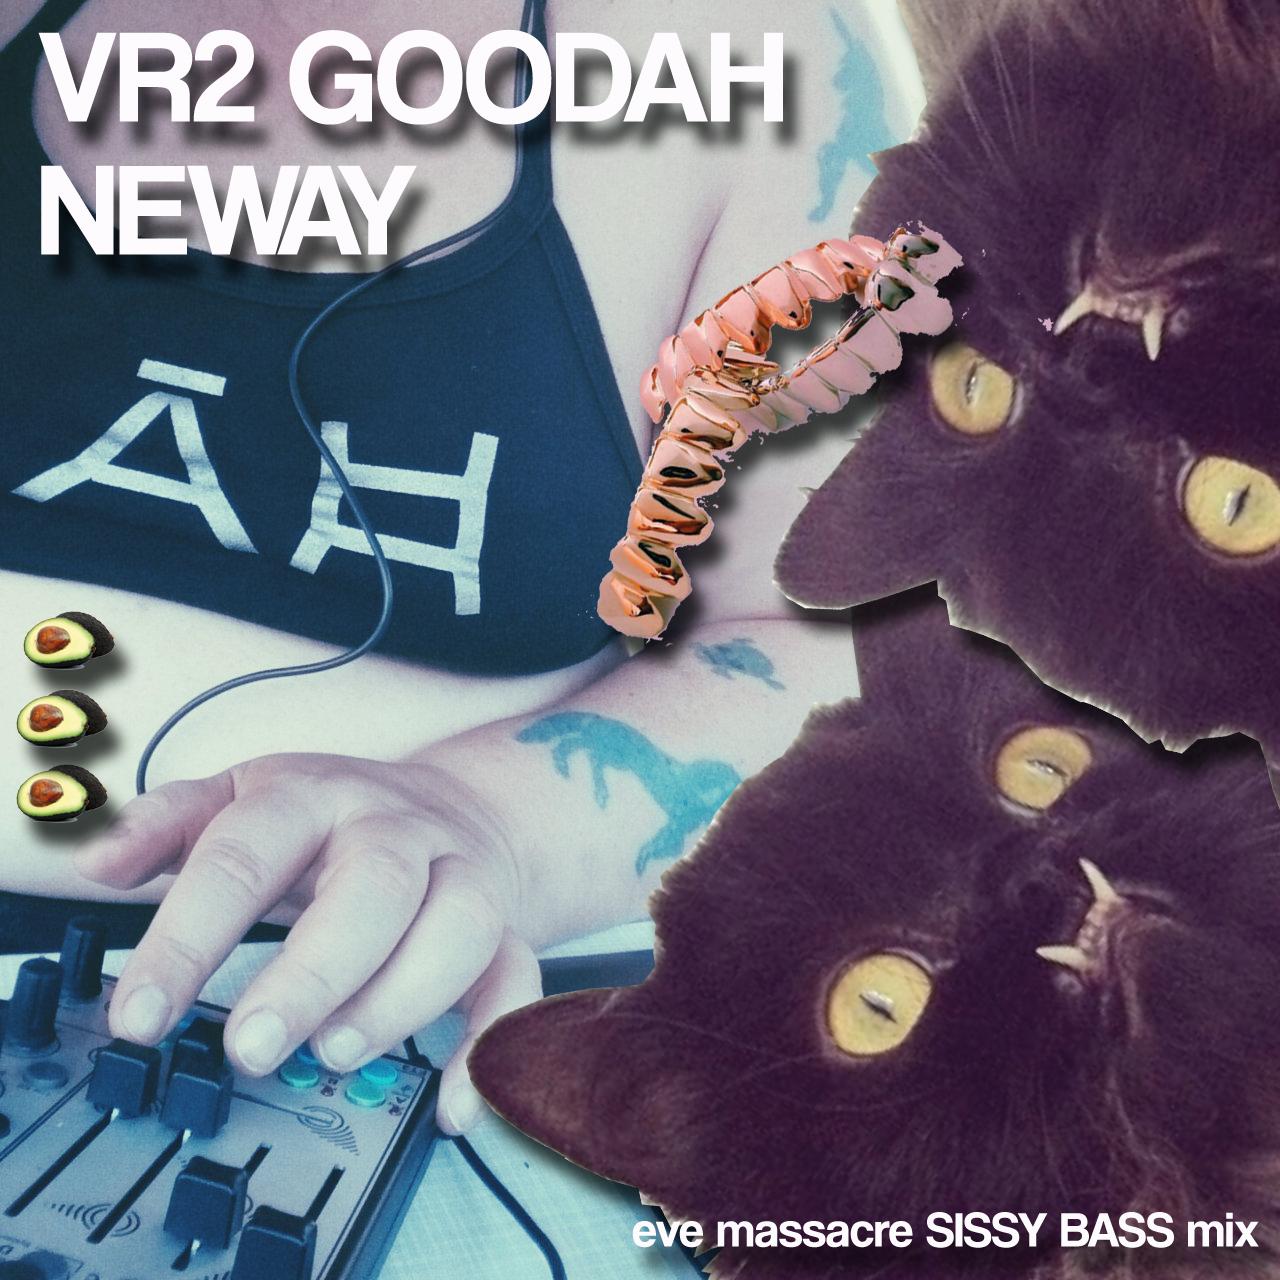 VR2goodahneway